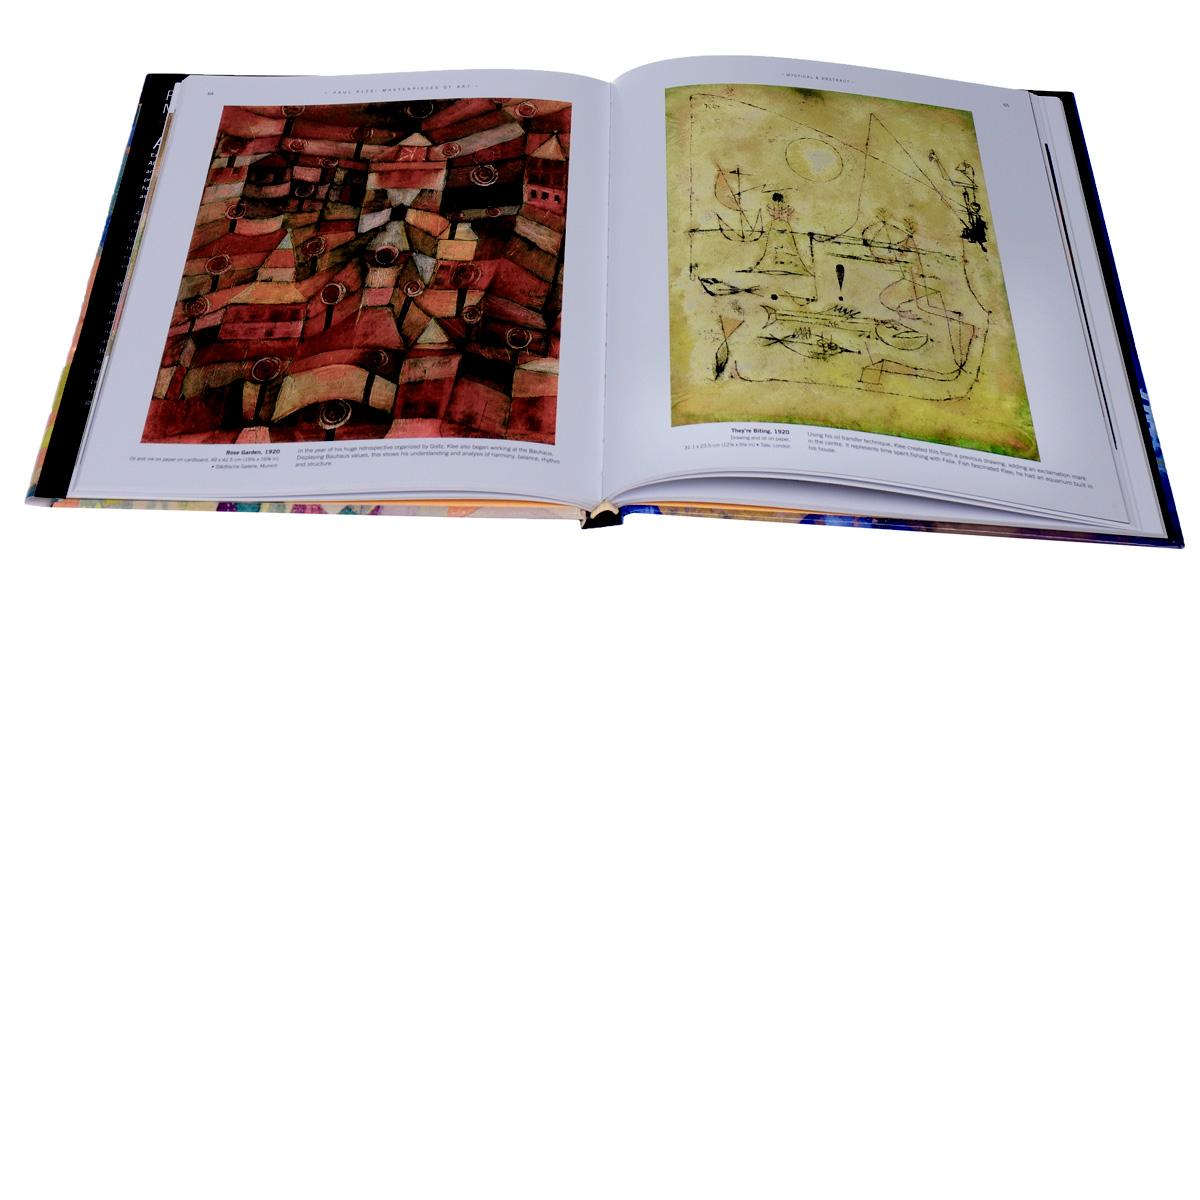 Paul Klee: Masterpieces of Art